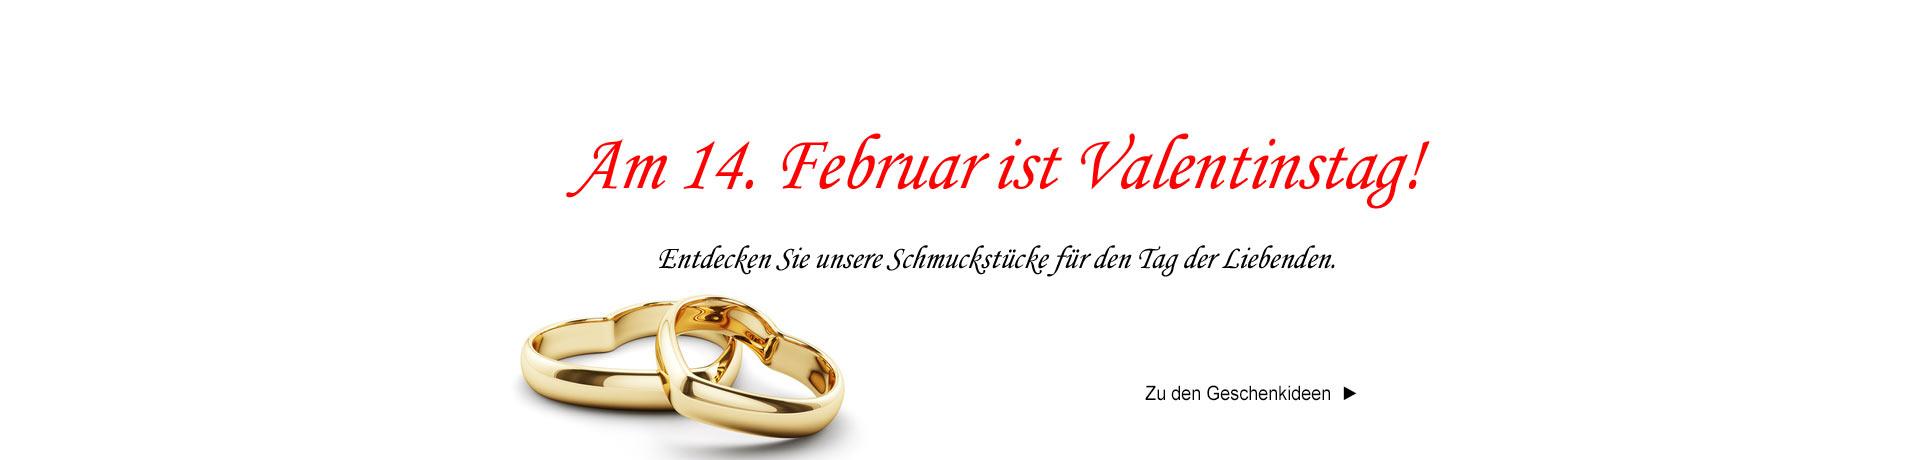 Valentinstag-Geschenkideen